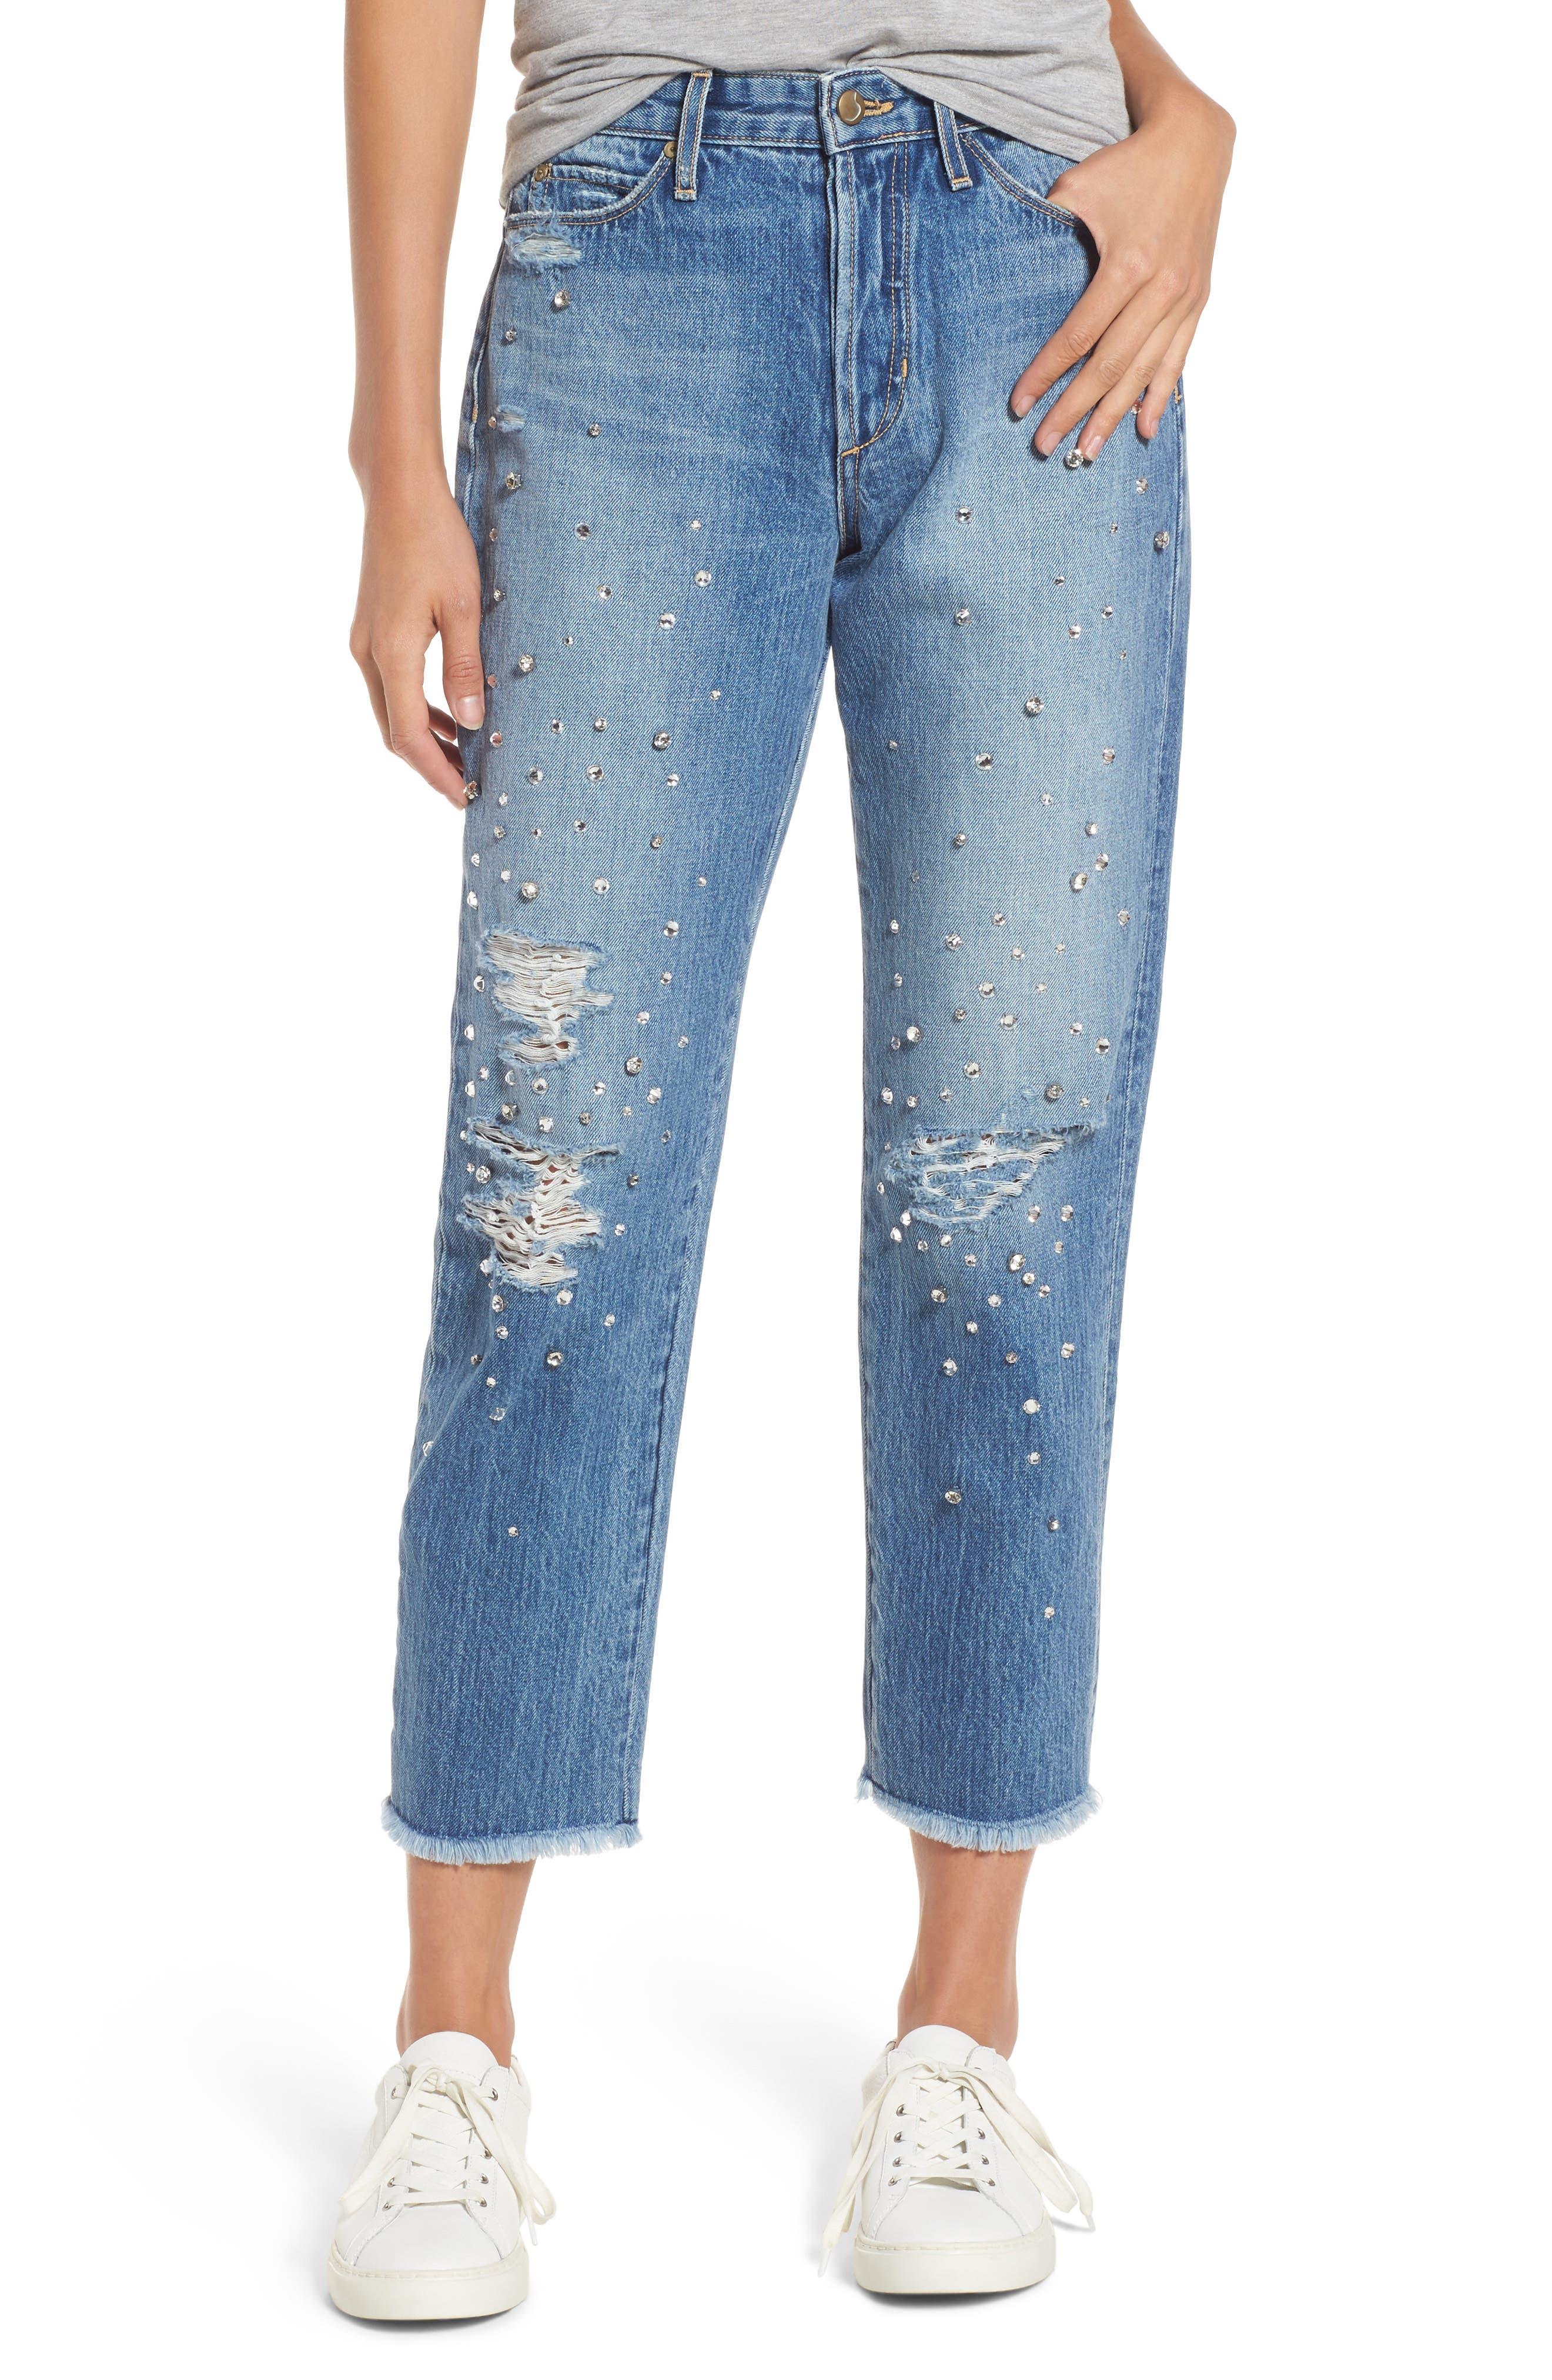 Jeans Smith Rhinestone Crop Boyfriend Jeans,                             Main thumbnail 1, color,                             450